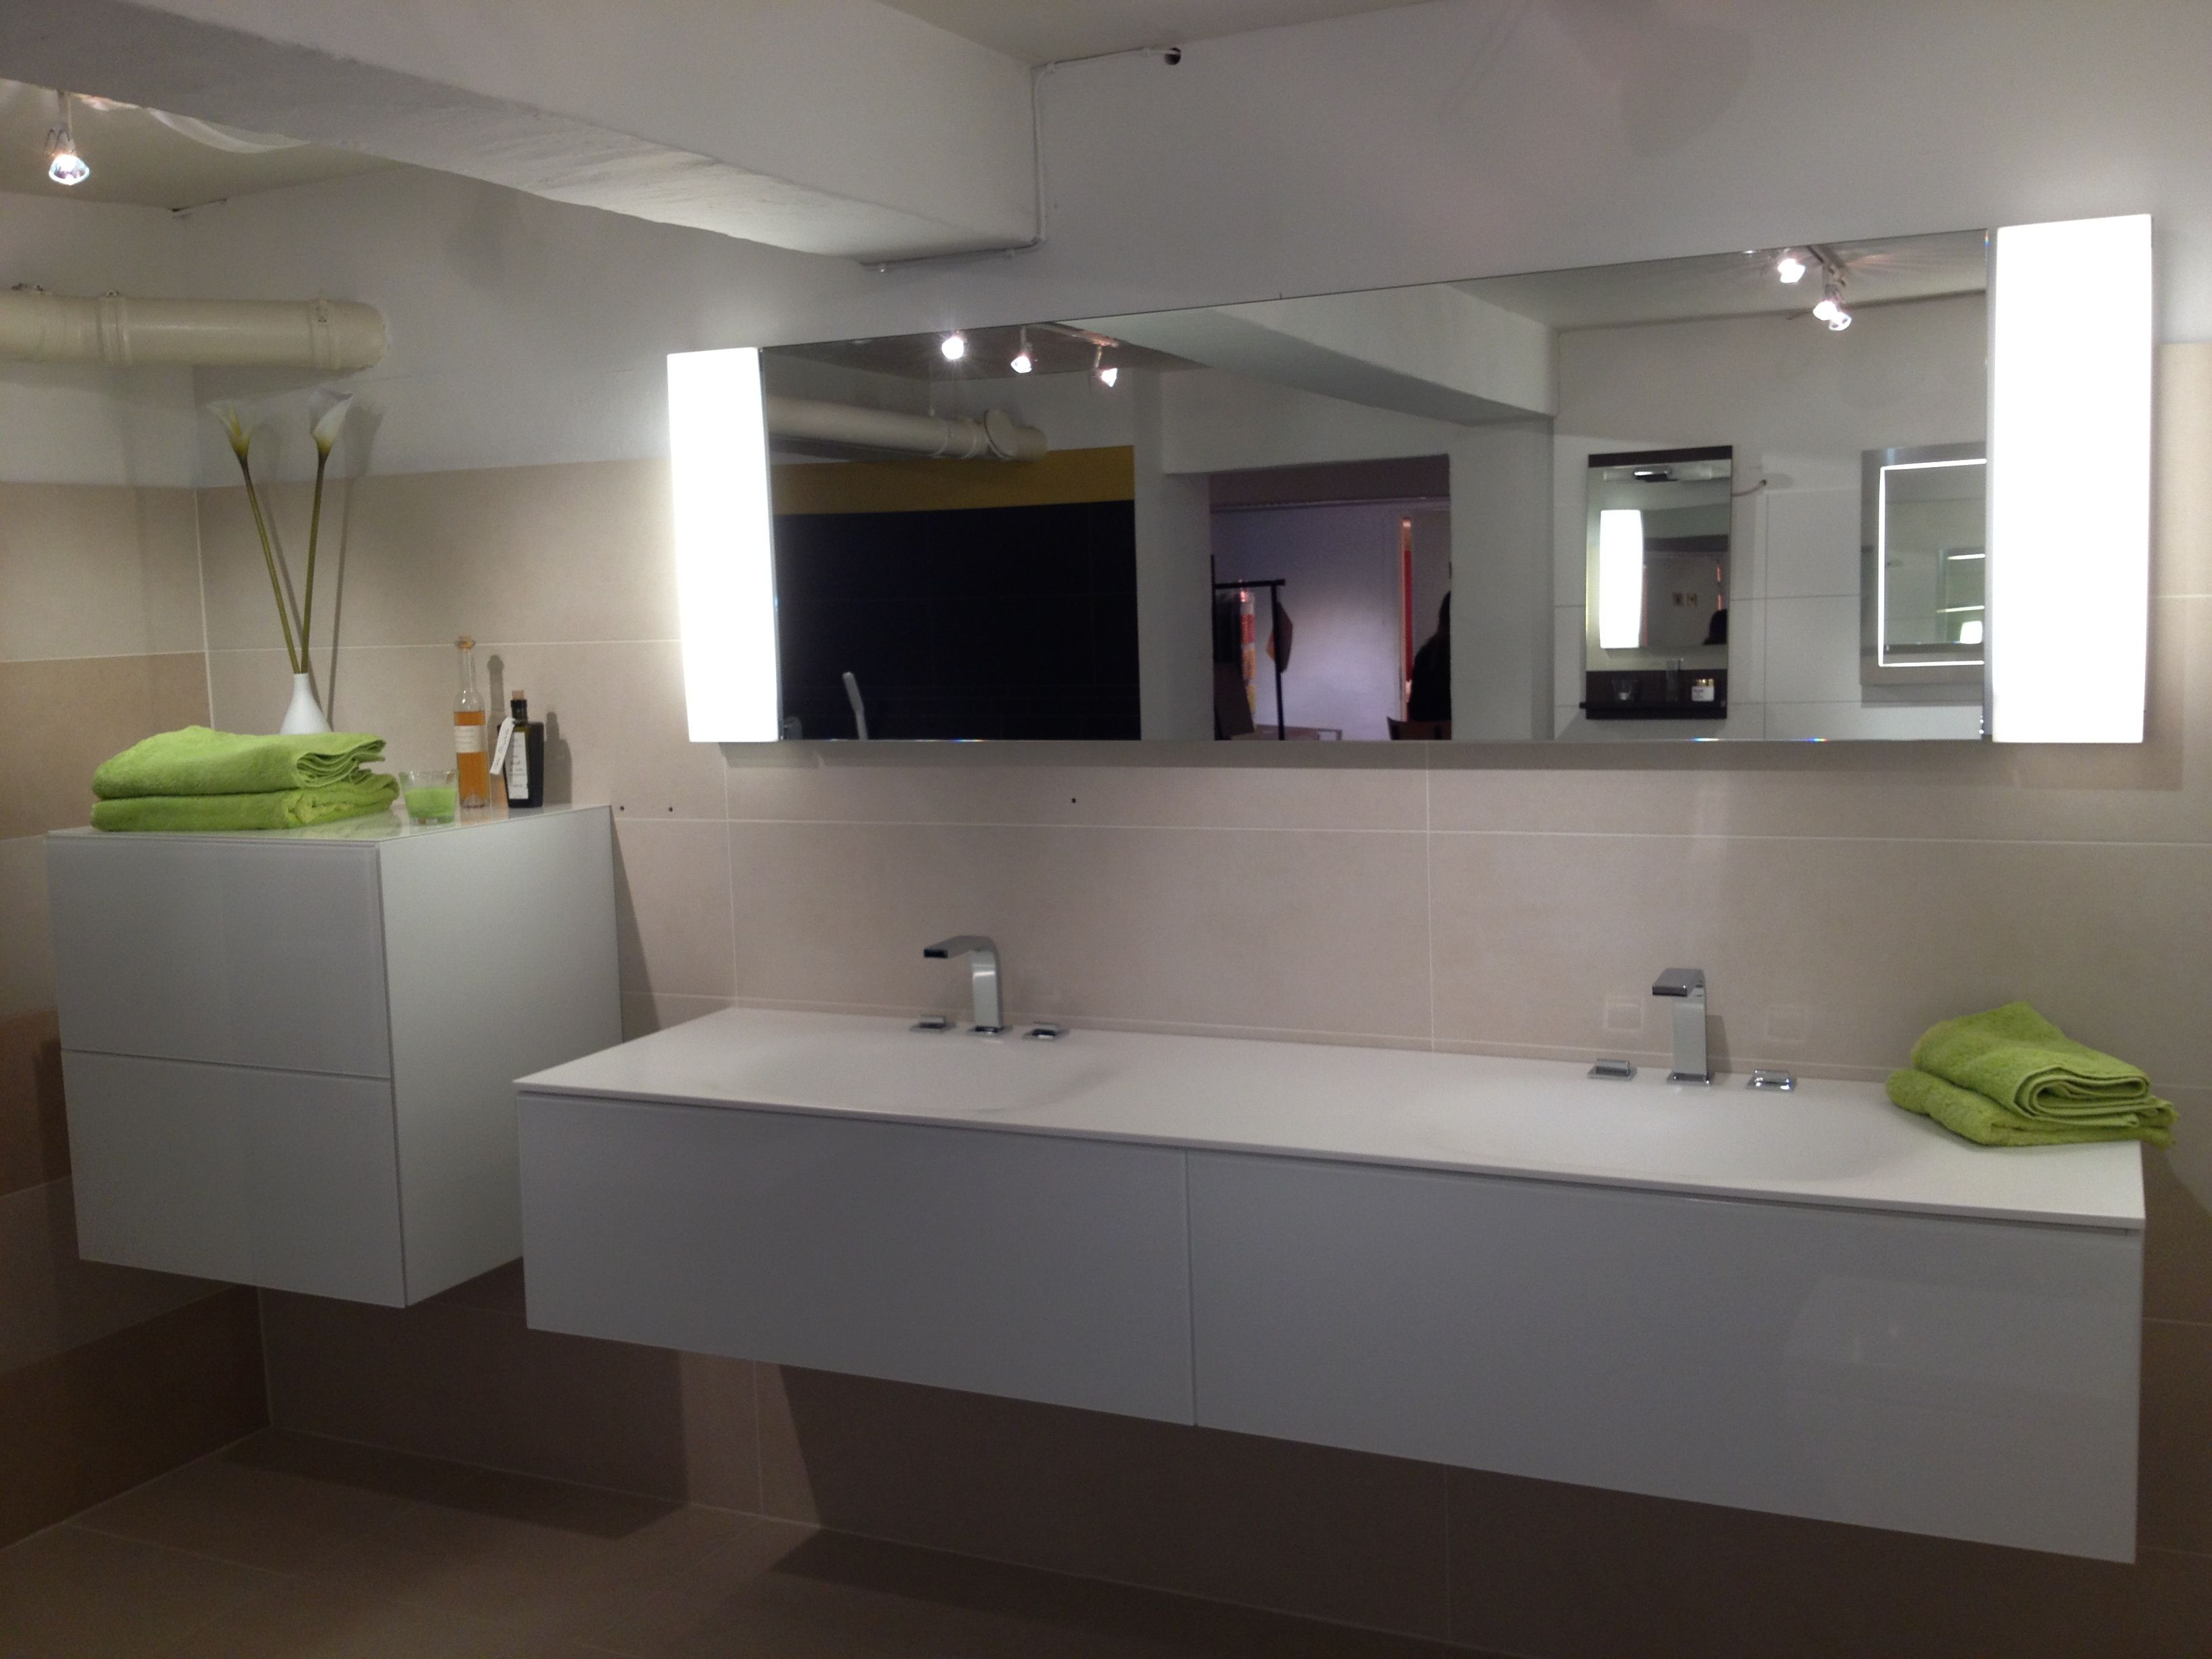 Bathroom funiture. Modern classic